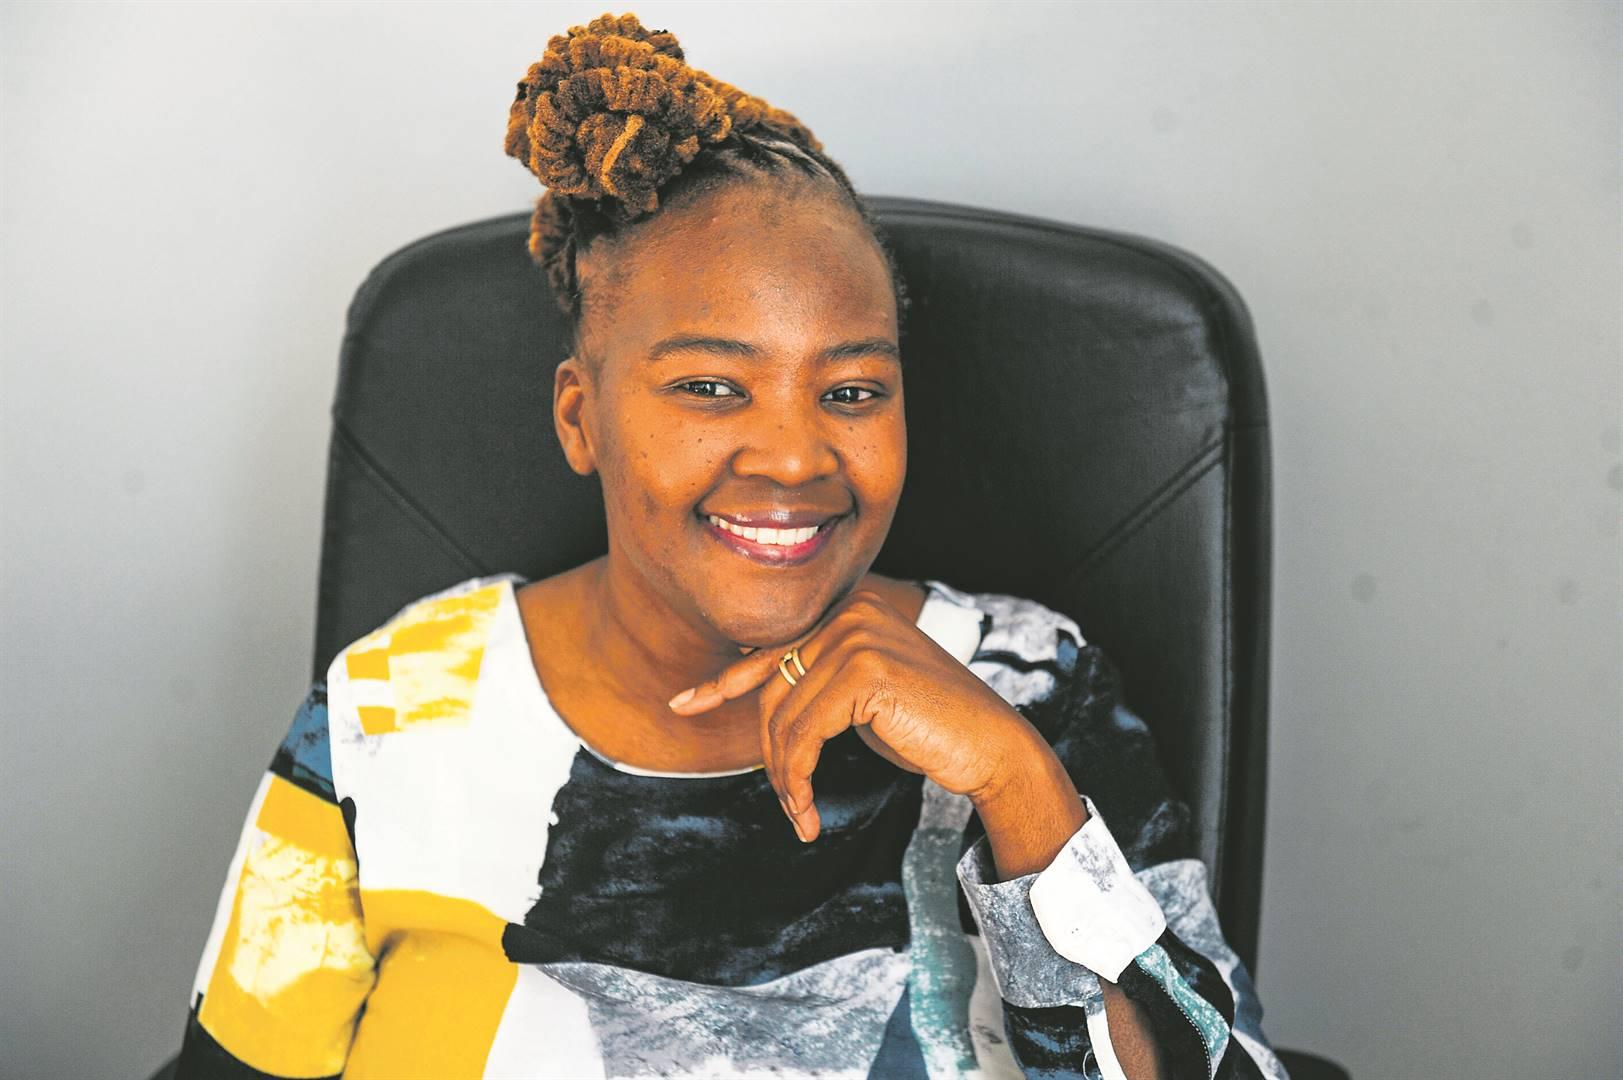 Sibongile Ndashe at Isla's offices in Johannesburg. Picture: ROSETTA MSIMANGO